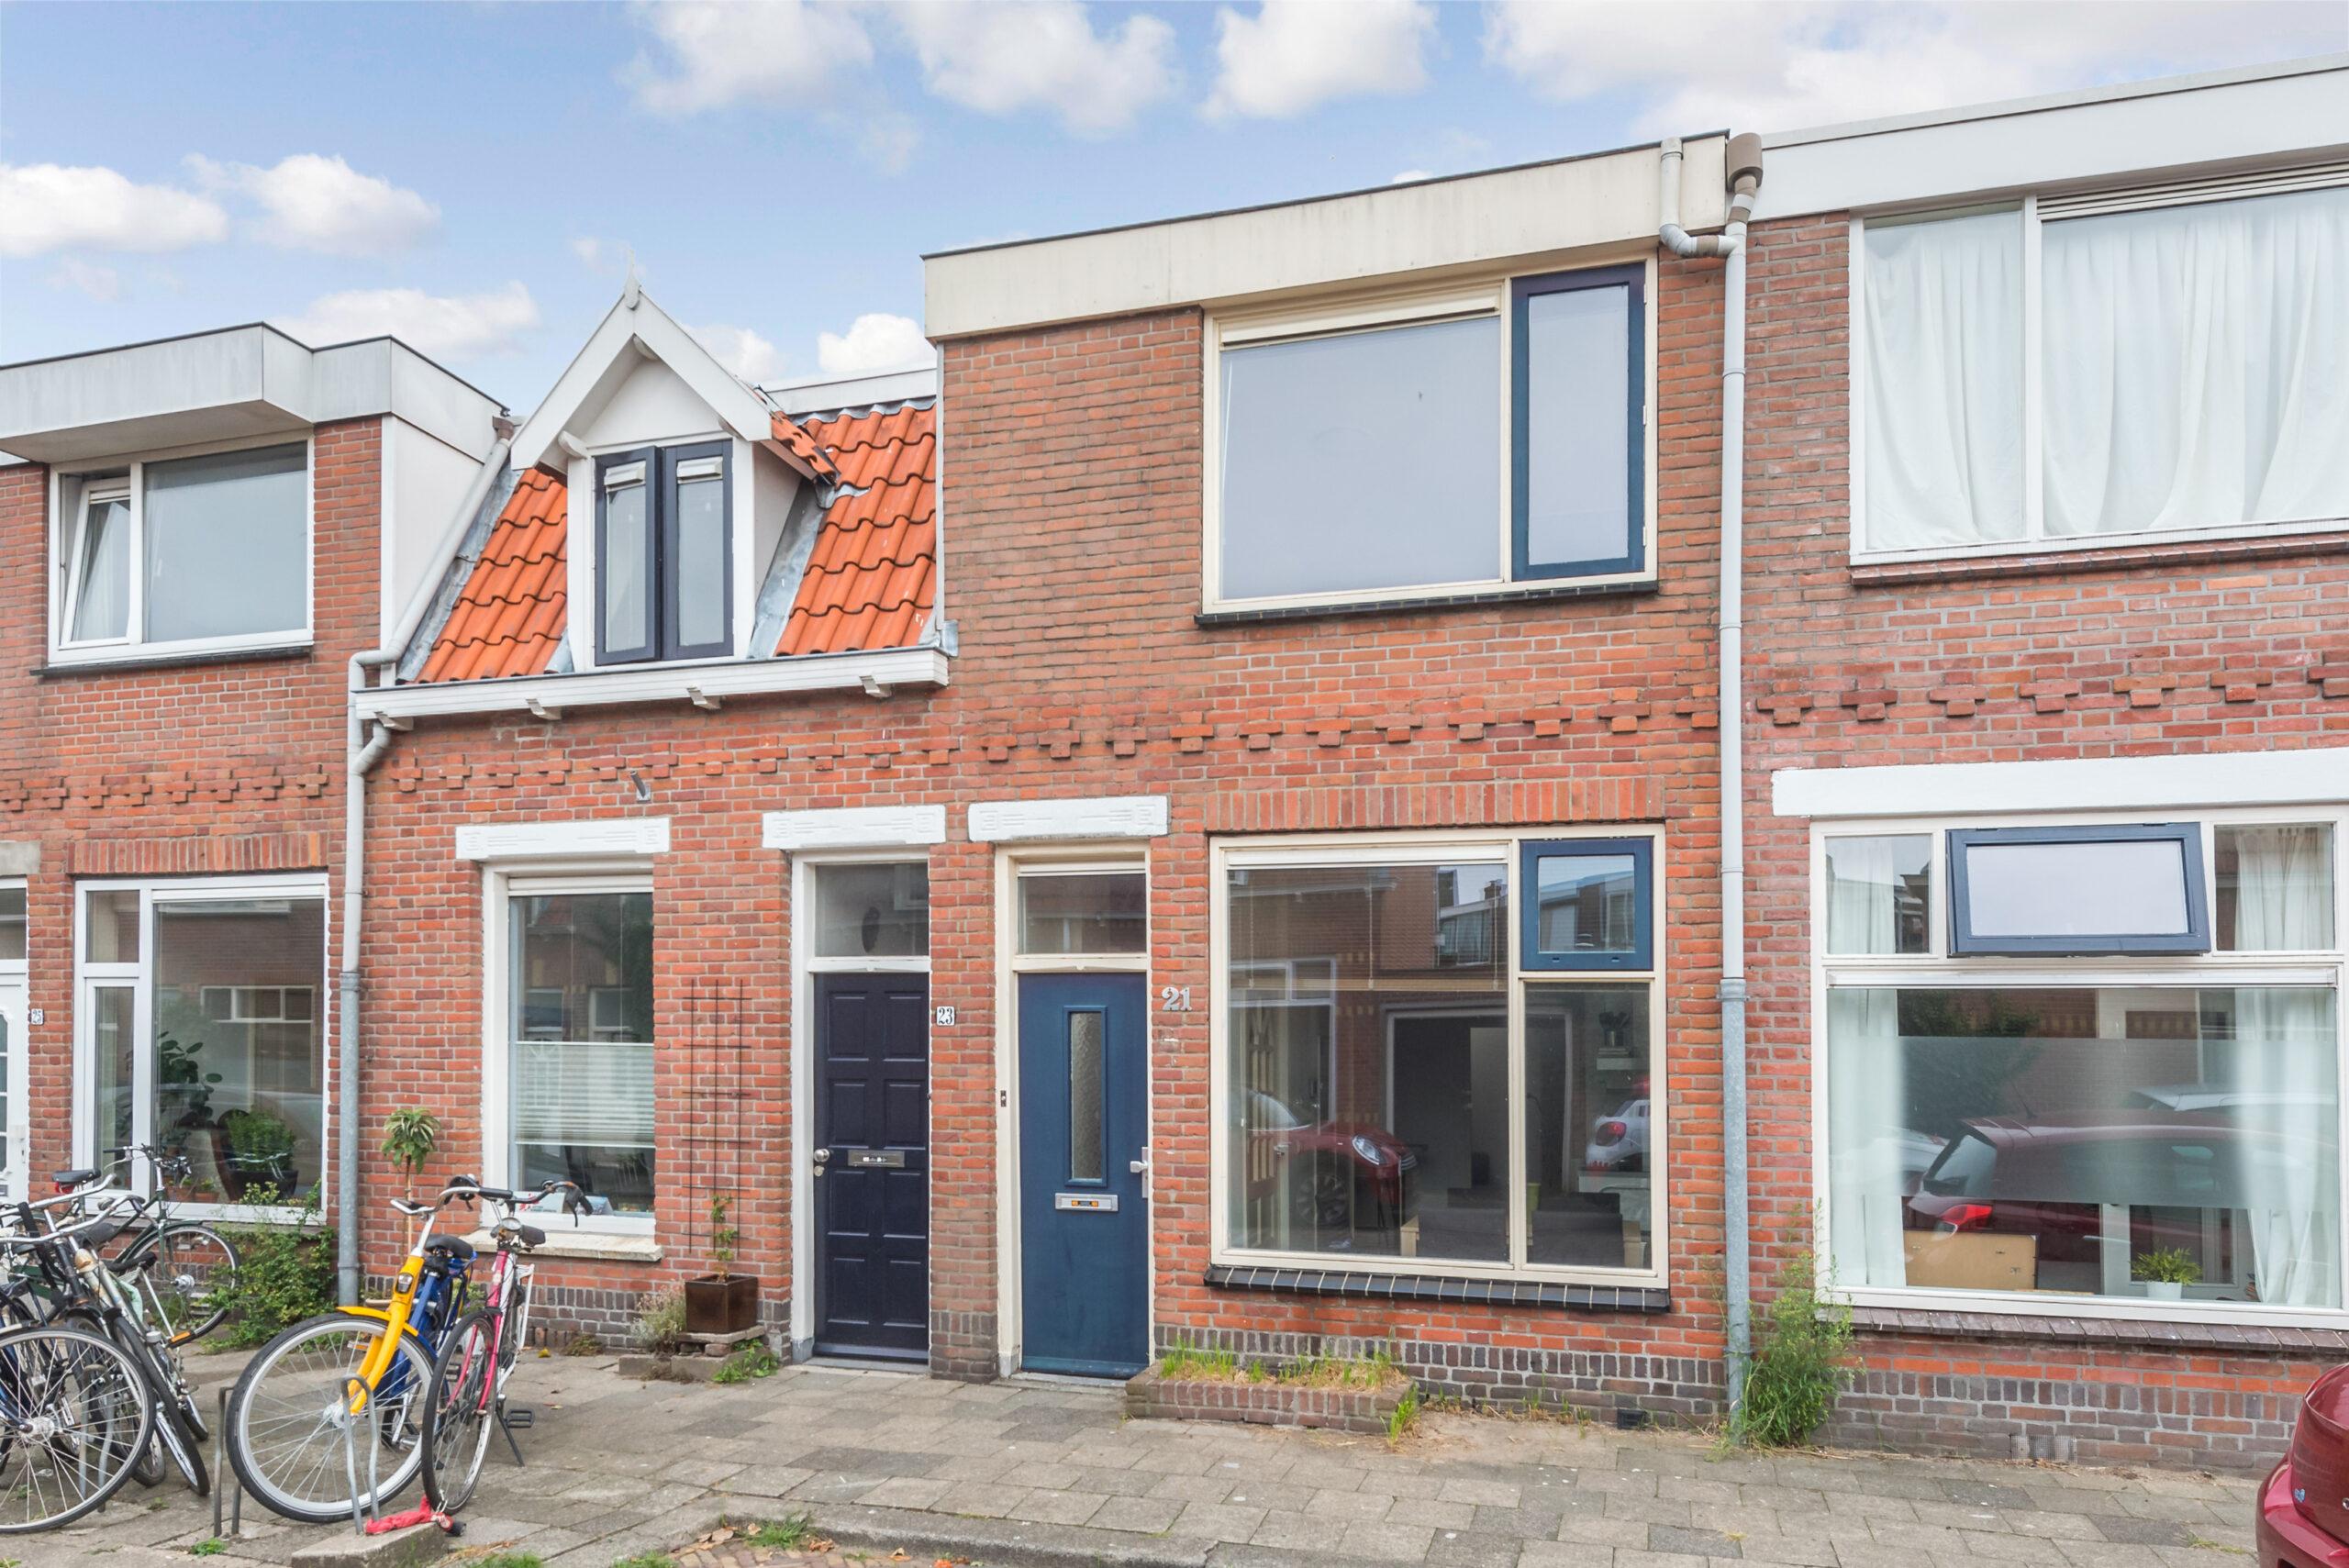 Bremstraat 21, 3551 TA Utrecht